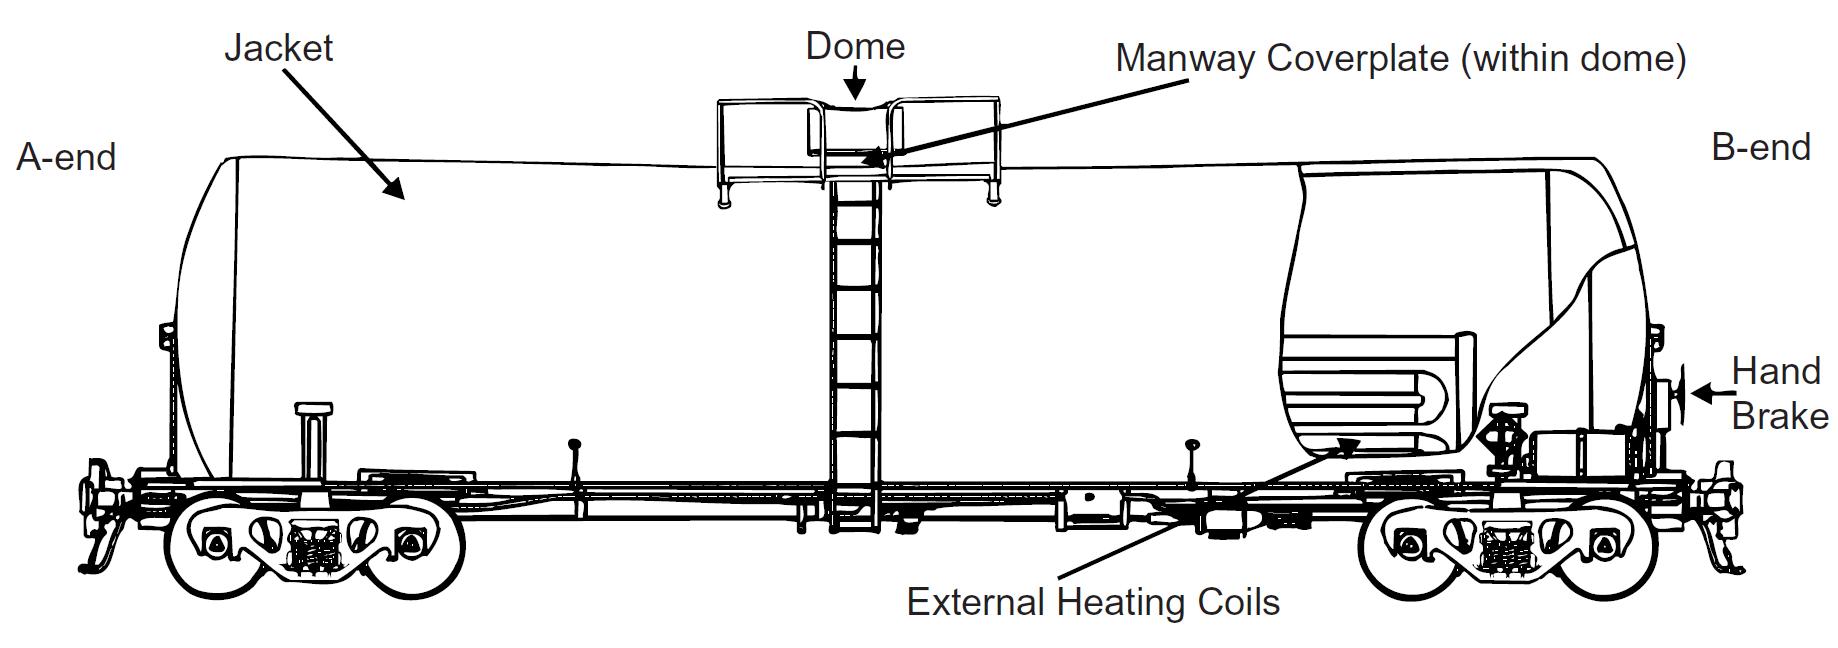 Railcar Diagram